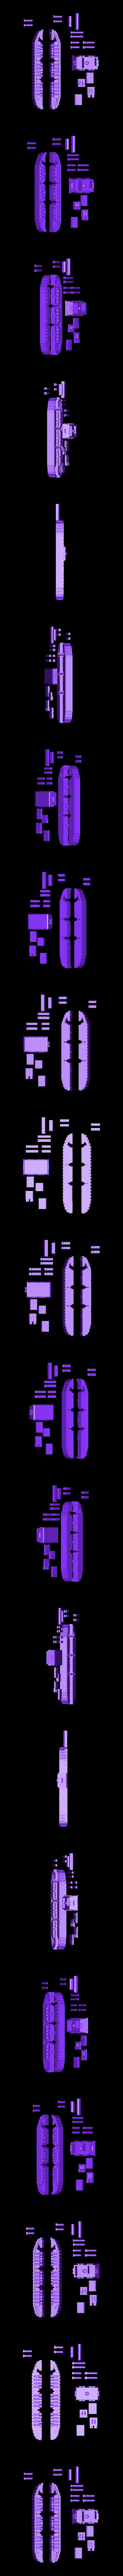 A7V-accesorios_1_100.stl Download free STL file A7v split parts • 3D printing template, TomasLA